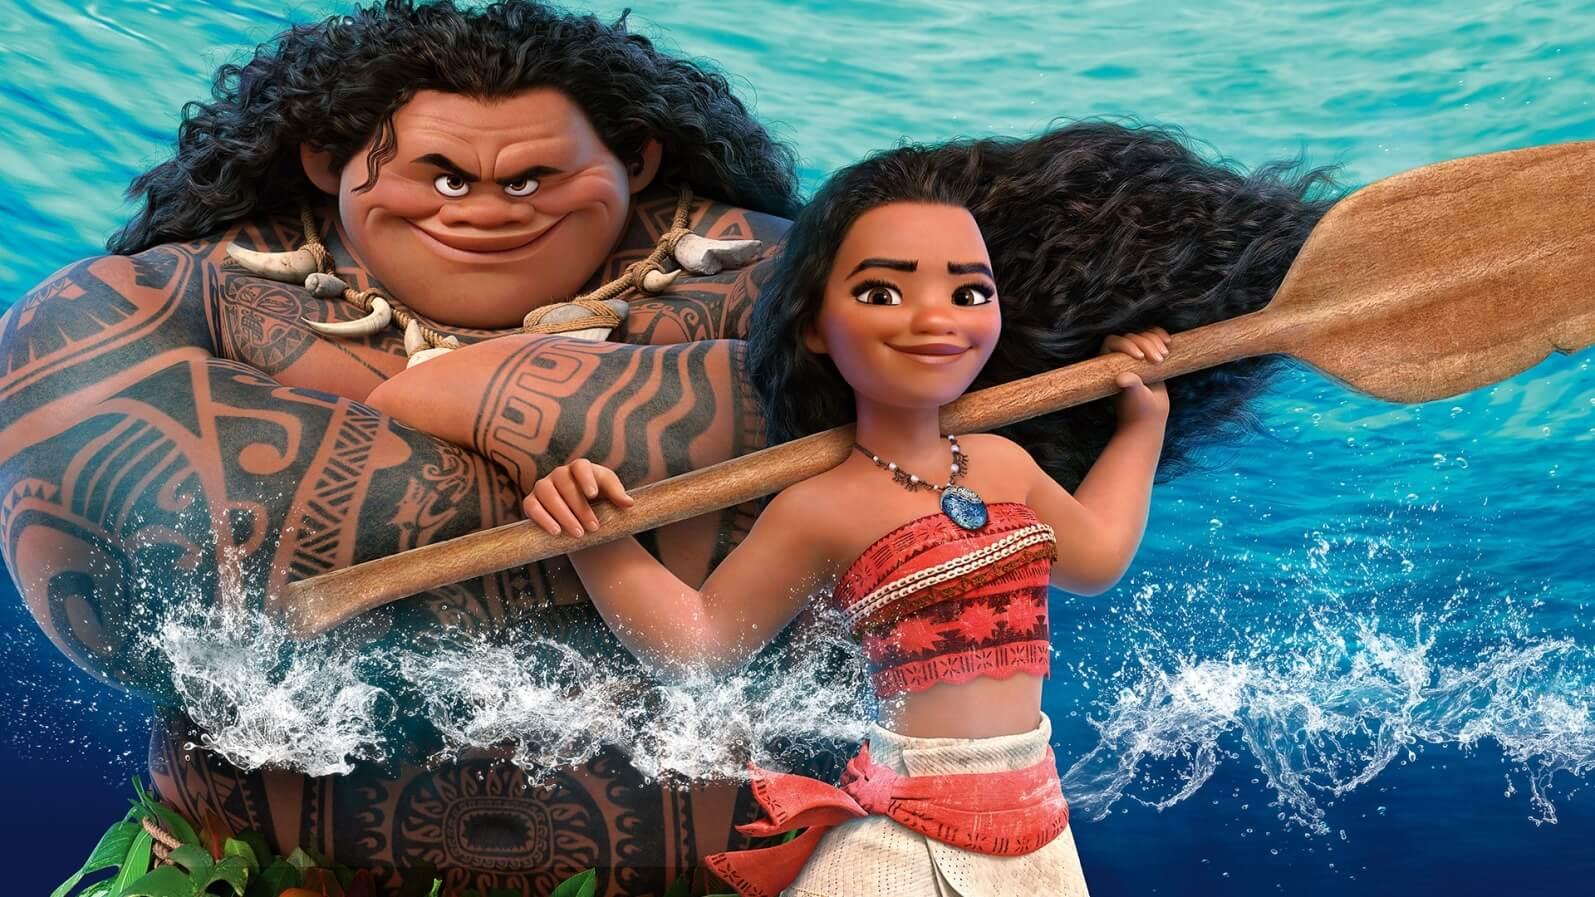 Moana and Maui - Original image